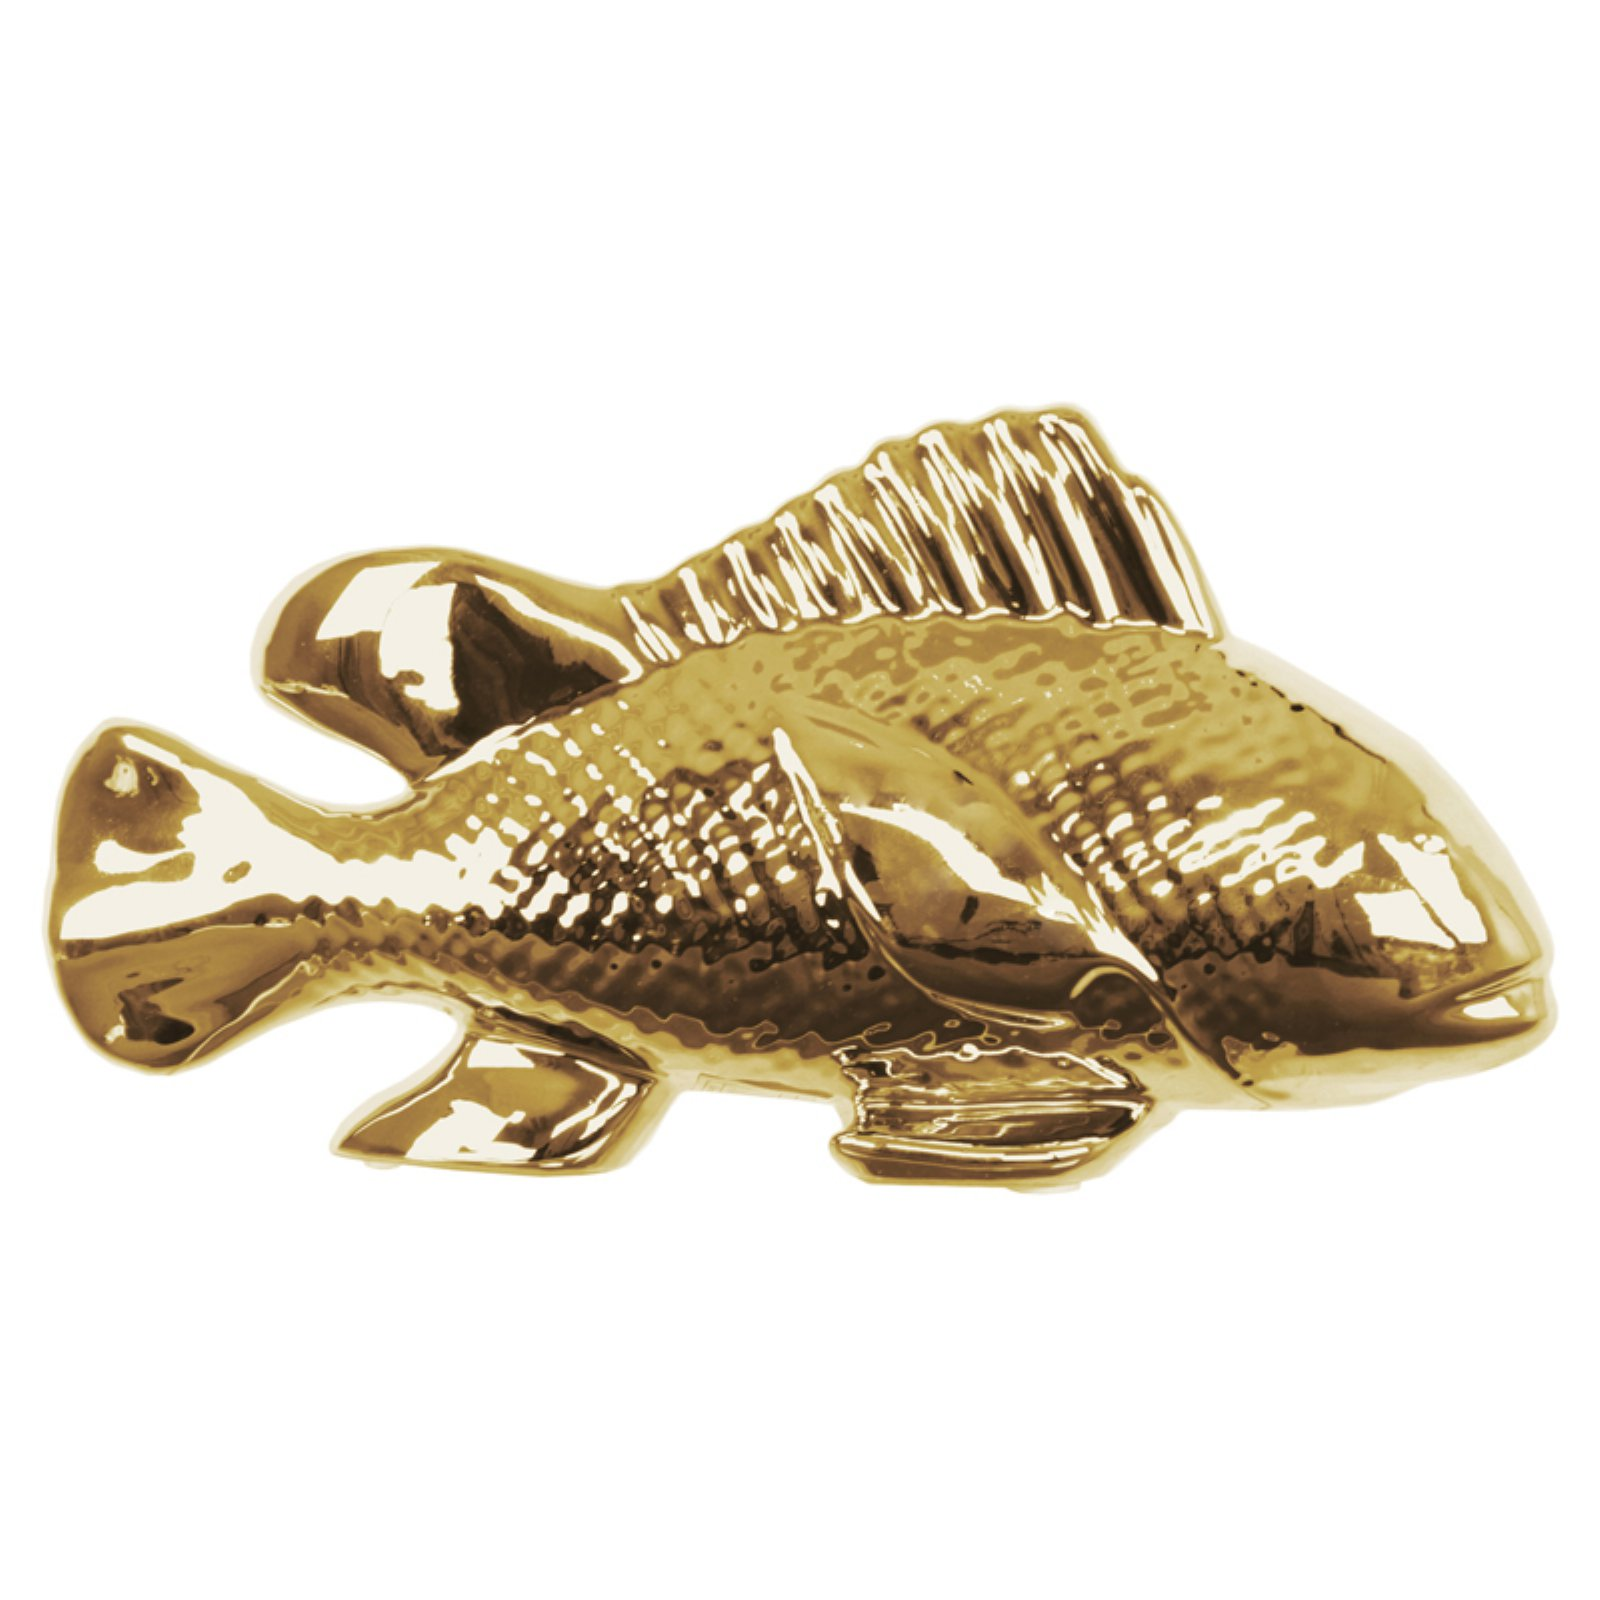 Urban Trends Collection: Ceramic Fish Figurine, Gloss Finish, White